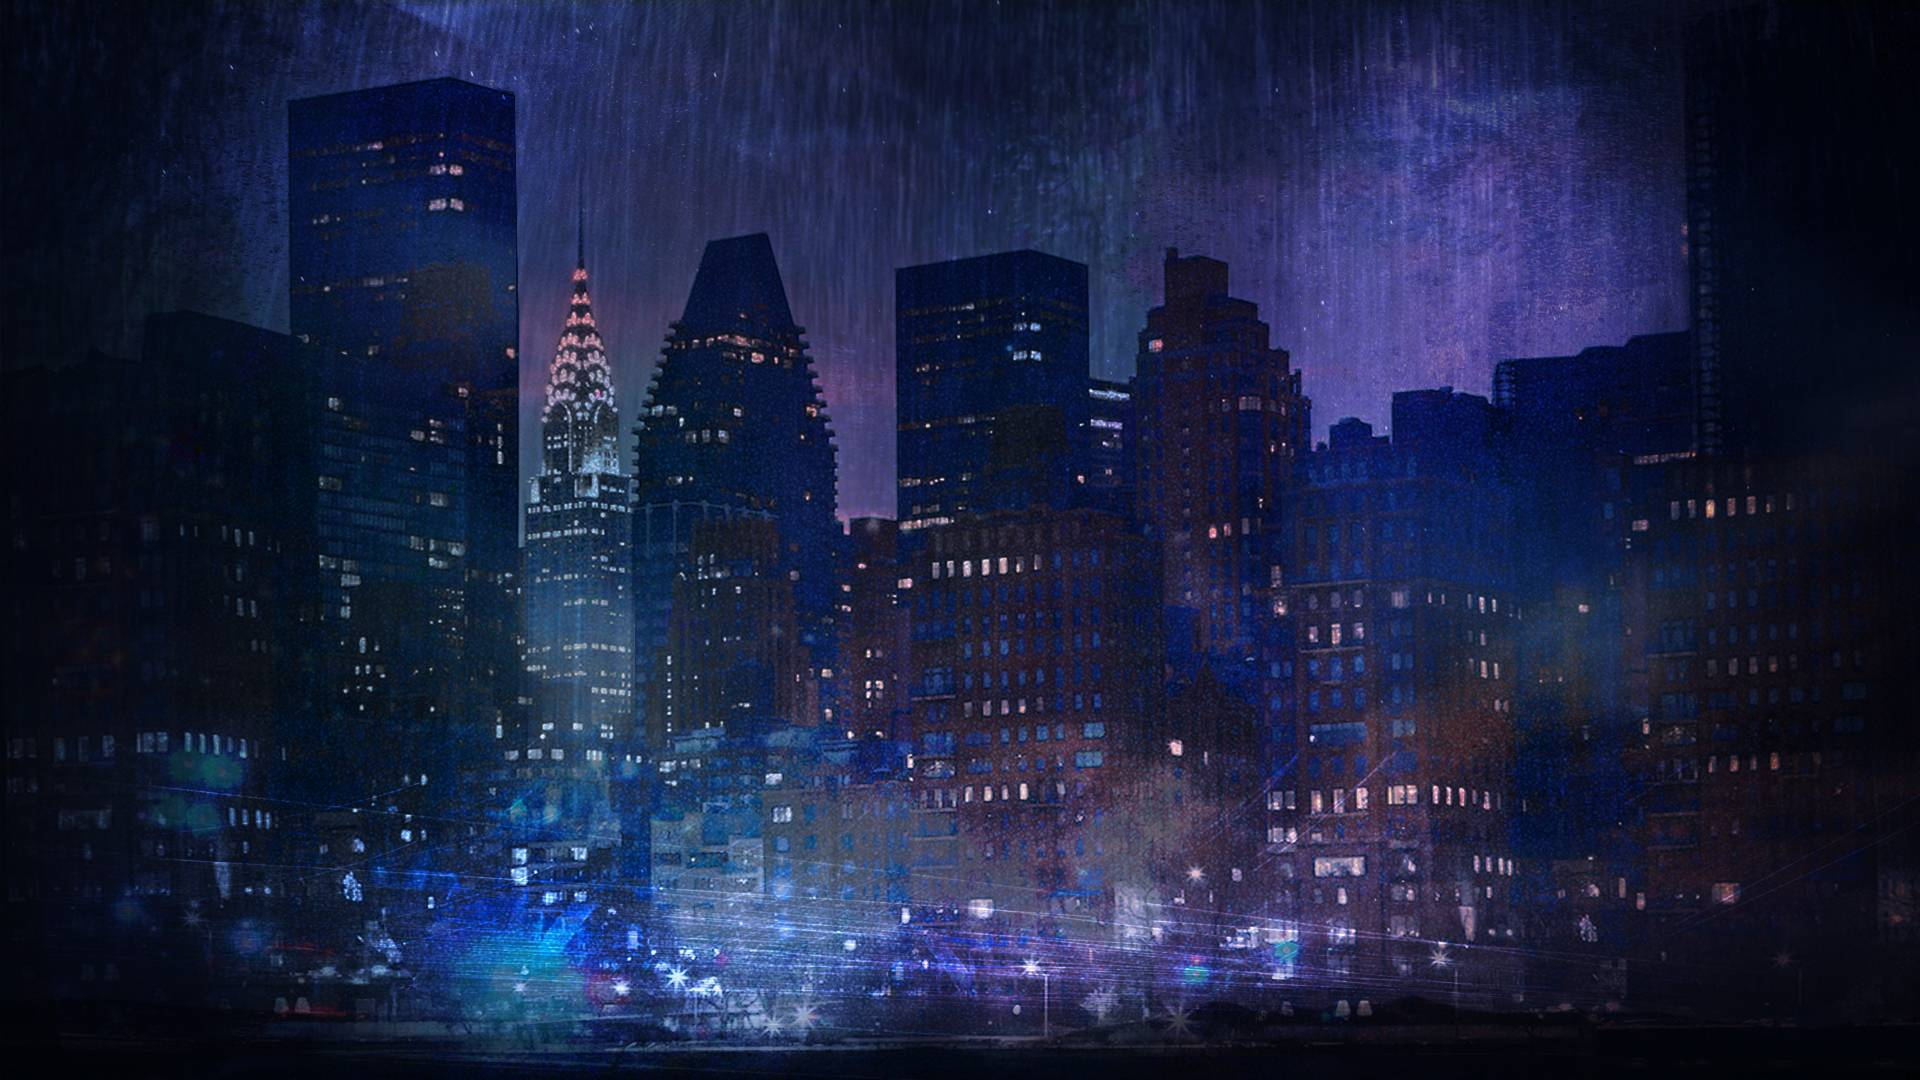 Студия Draw Distance анонсировала ещё одну игру по Vampire: The Masquerade 6